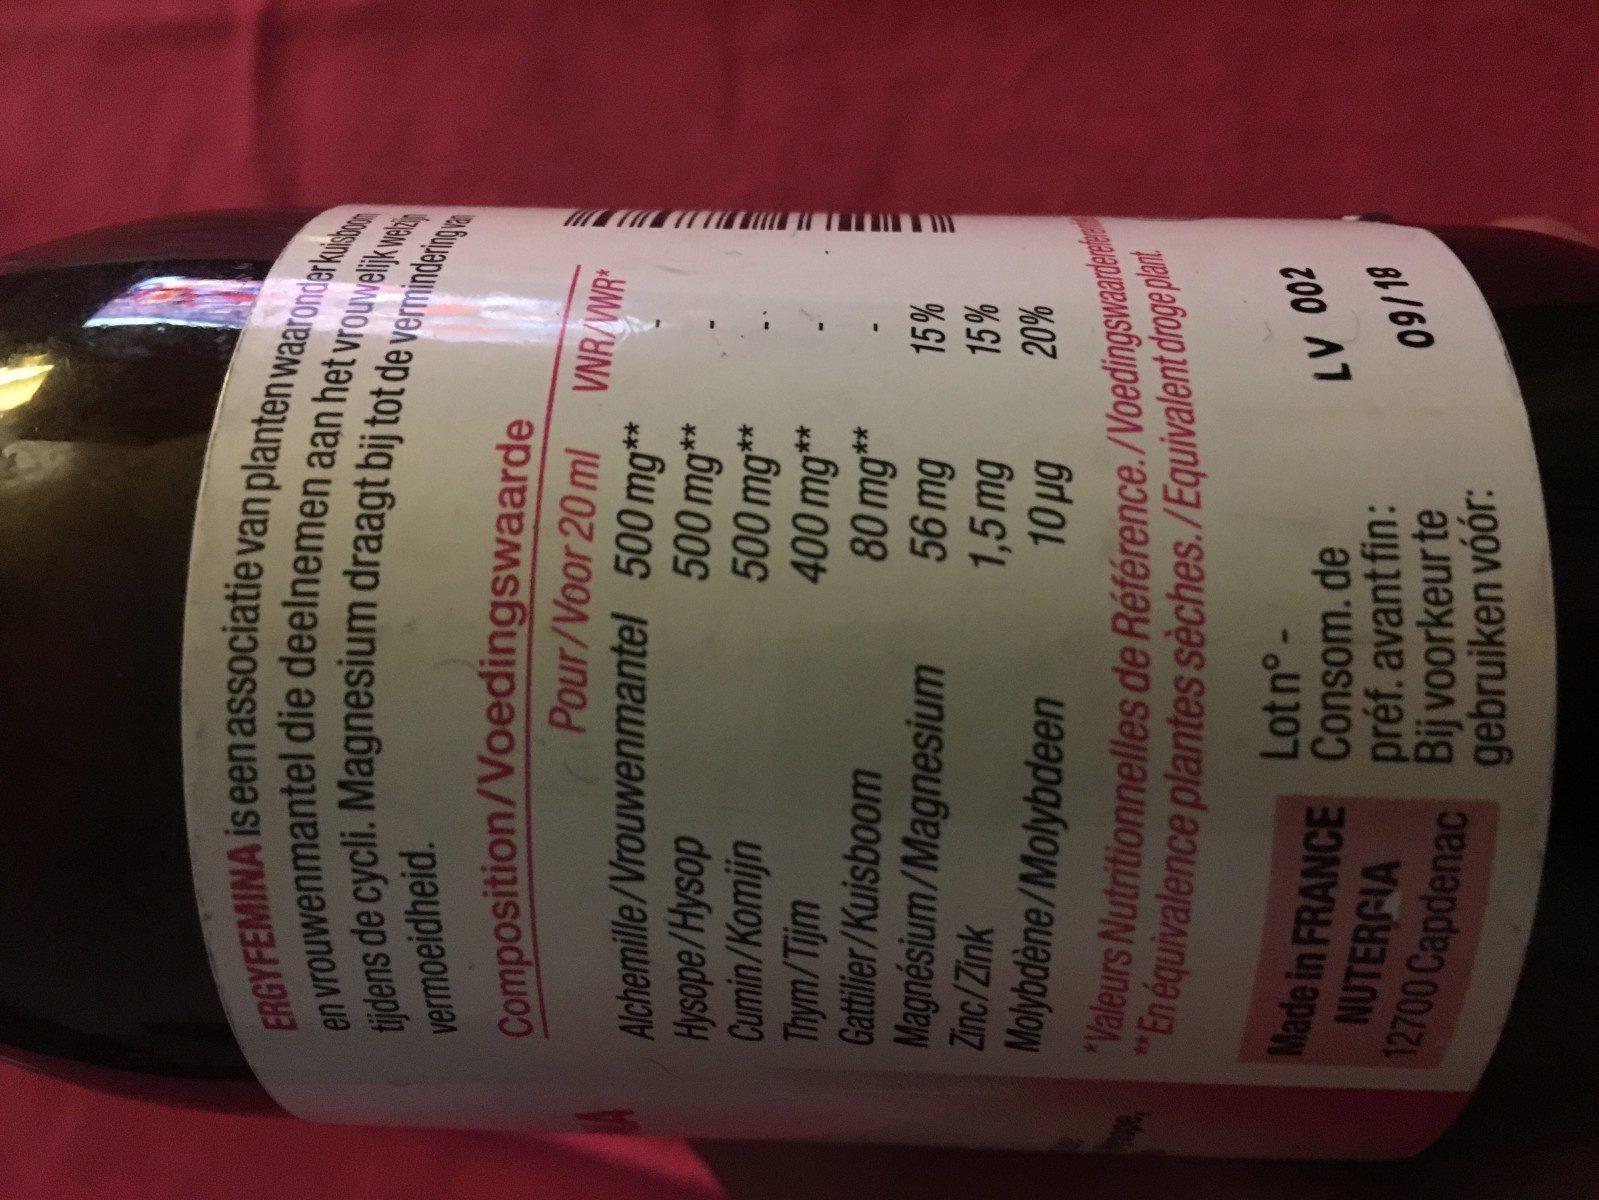 Ergyfemina Ménopause - 250 ML - Nutergia - Ingrediënten